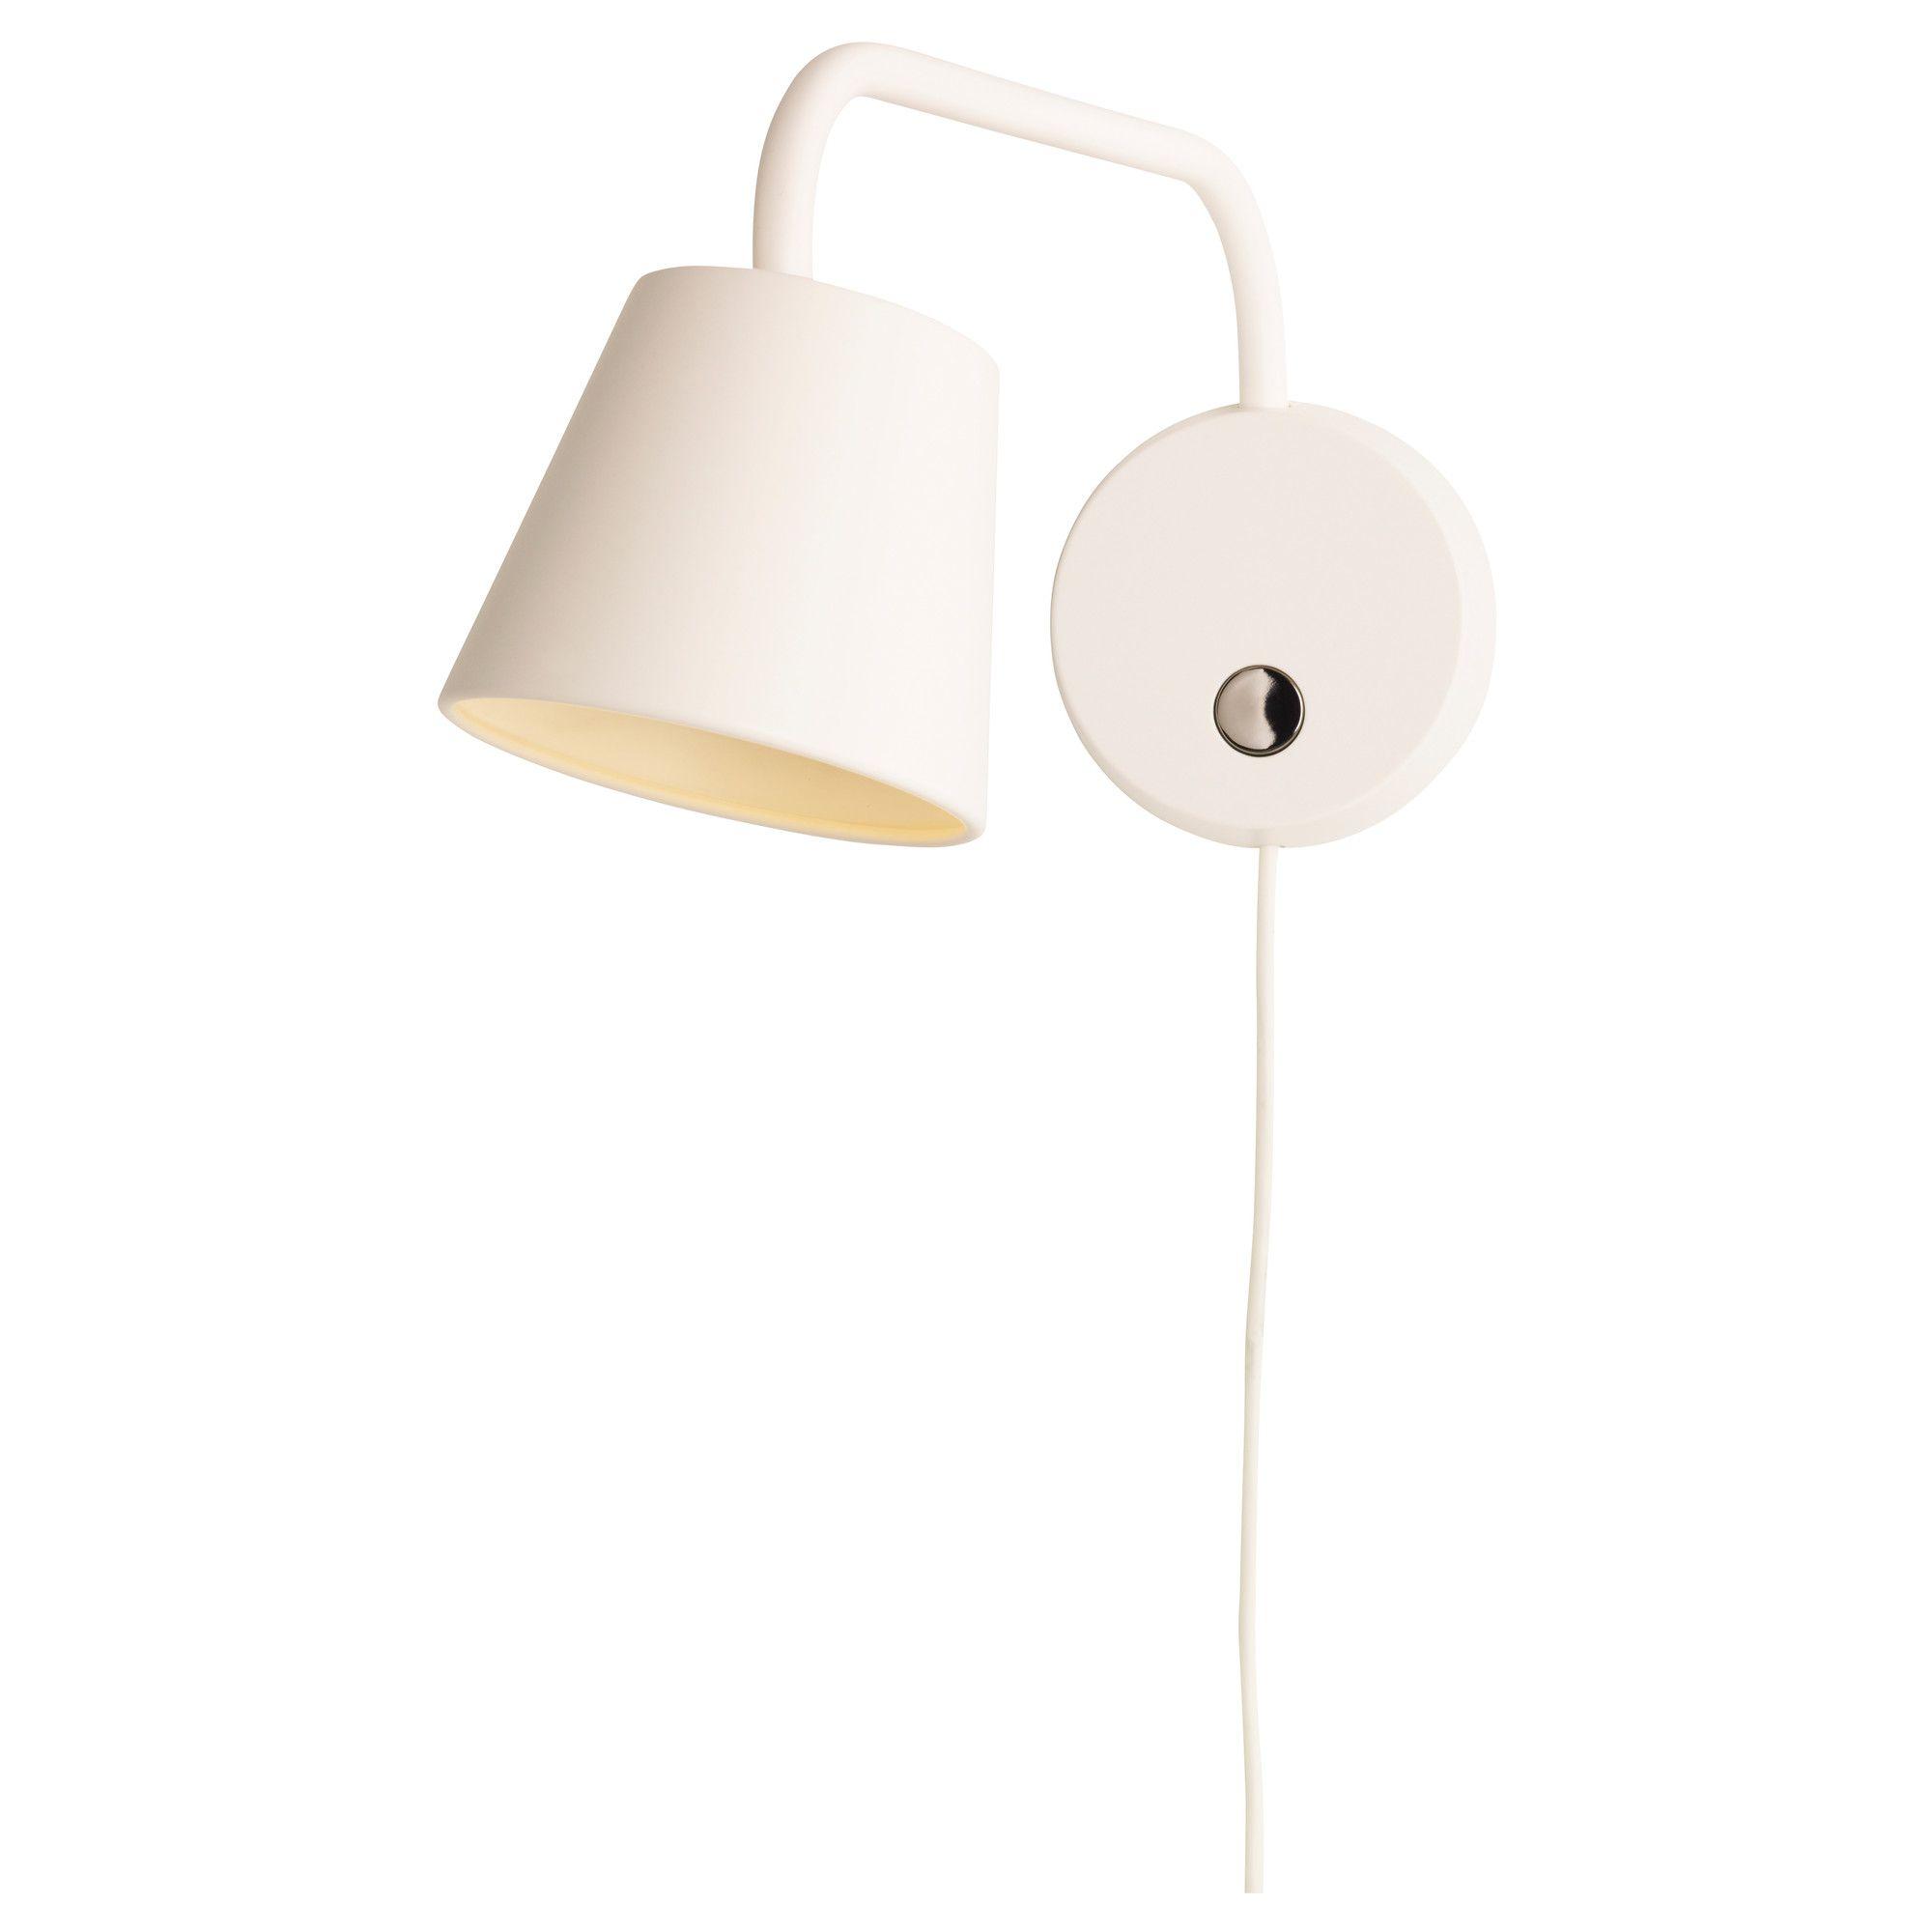 c6fba9b875fe8b7213caee74ae62bea4 30 Frais Lampe Cuivre Ikea Ksh4